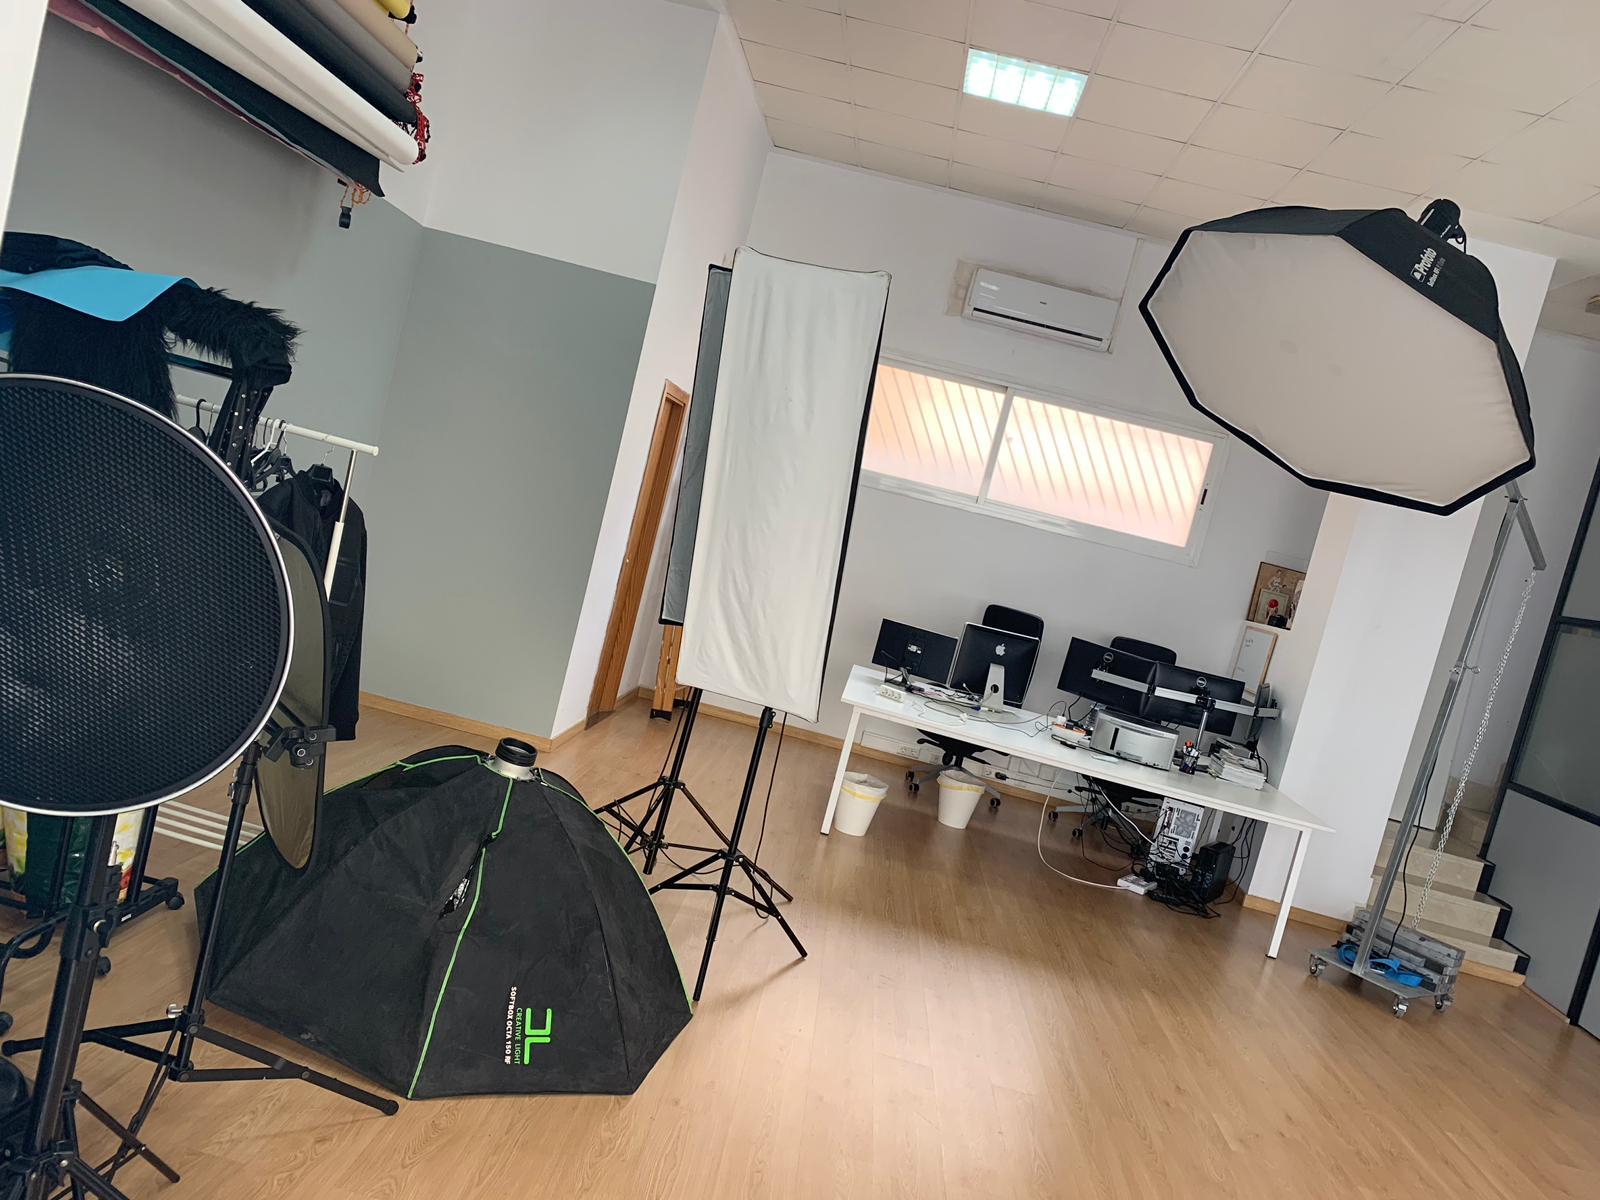 DerekSolutions office for web design and app development in Palma de Mallorca